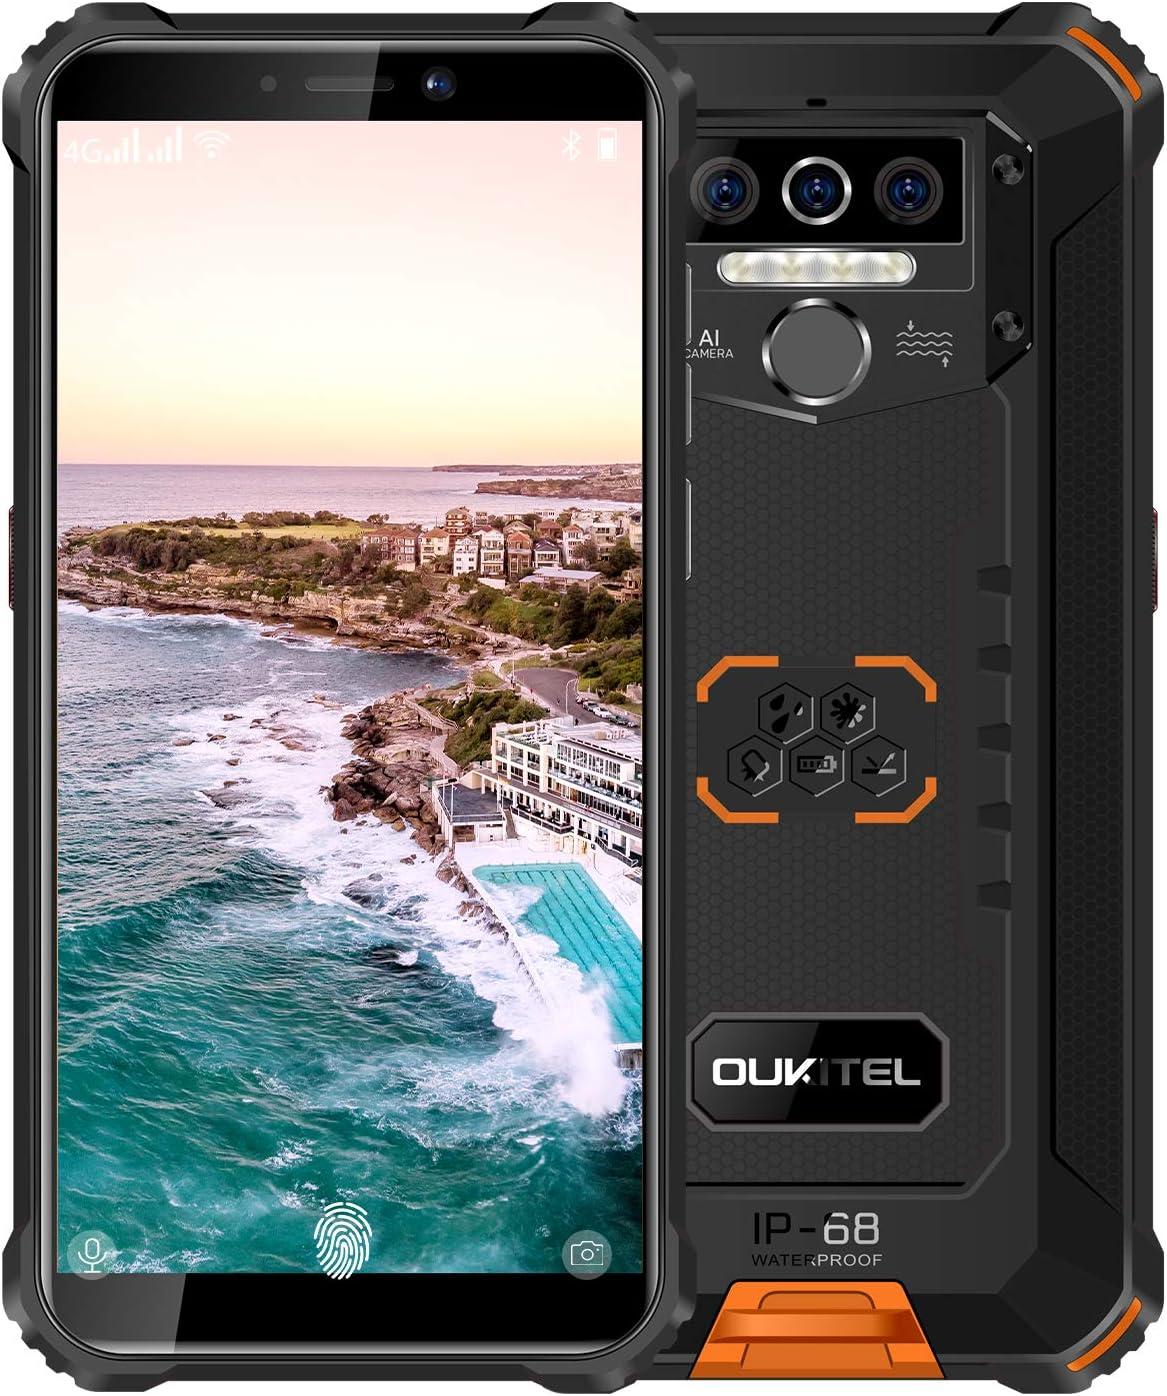 "Rugged Smartphone Unlocked OUKITEL WP5(2020) Android 10.0 Dual Sim Cell Phone 4GB+32GB 8000mAh IP68 Waterproof 5.5"" International Version GSM 4G AT&T T-Mobile(Orange)"